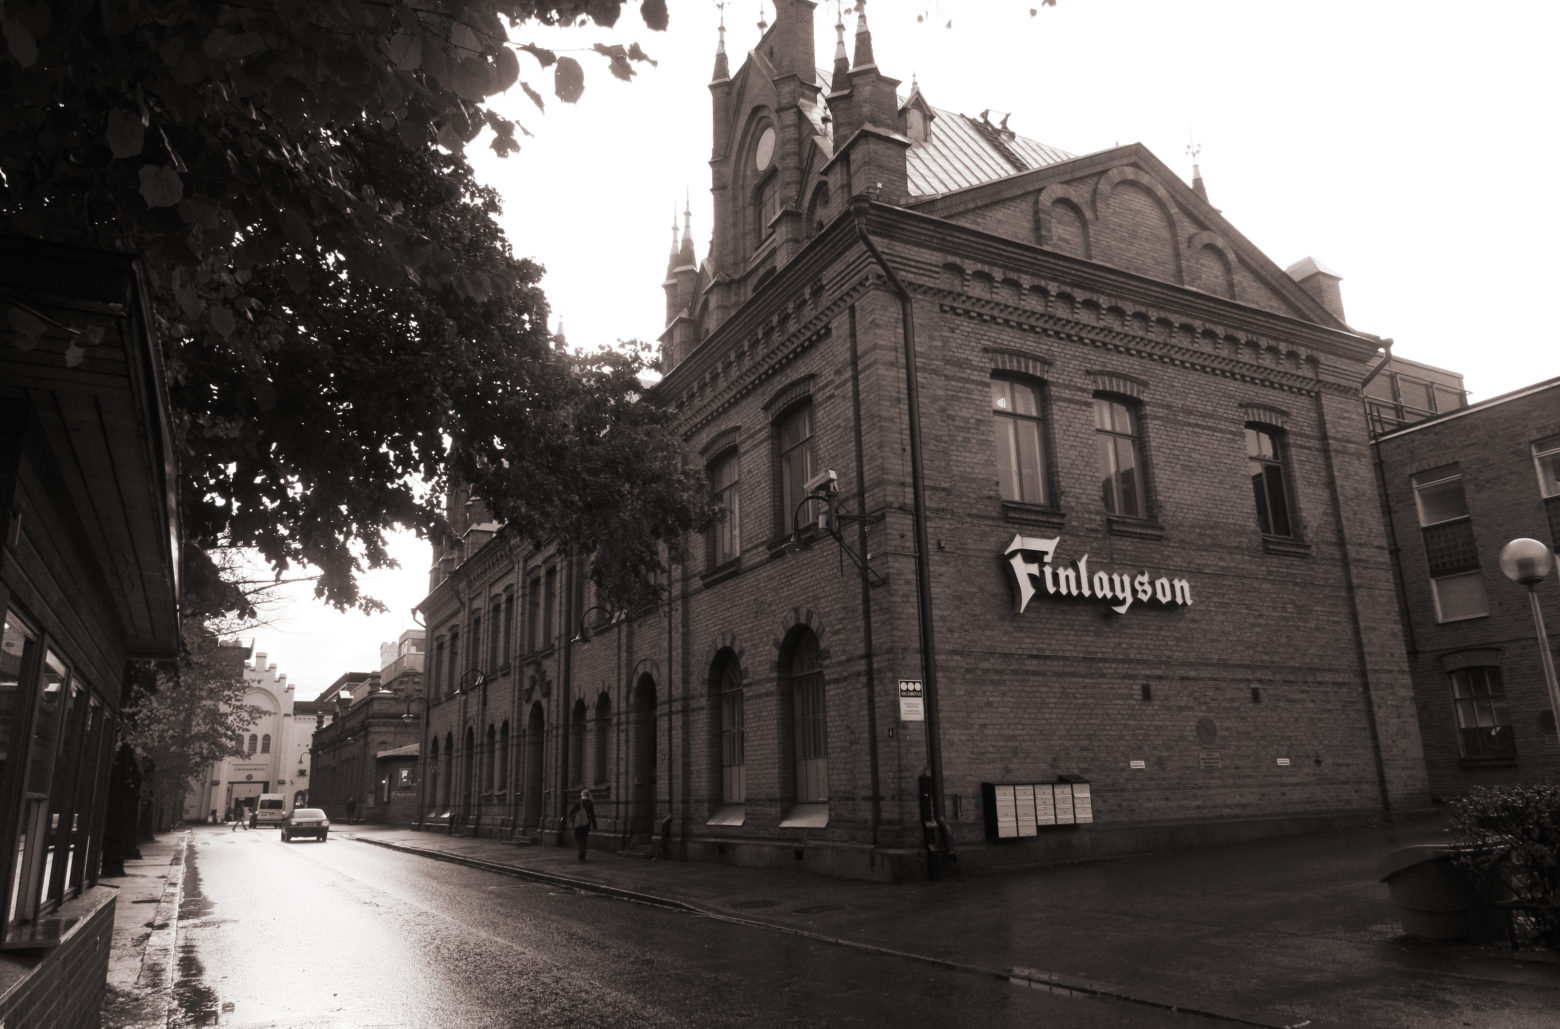 Finlayson Tehdas